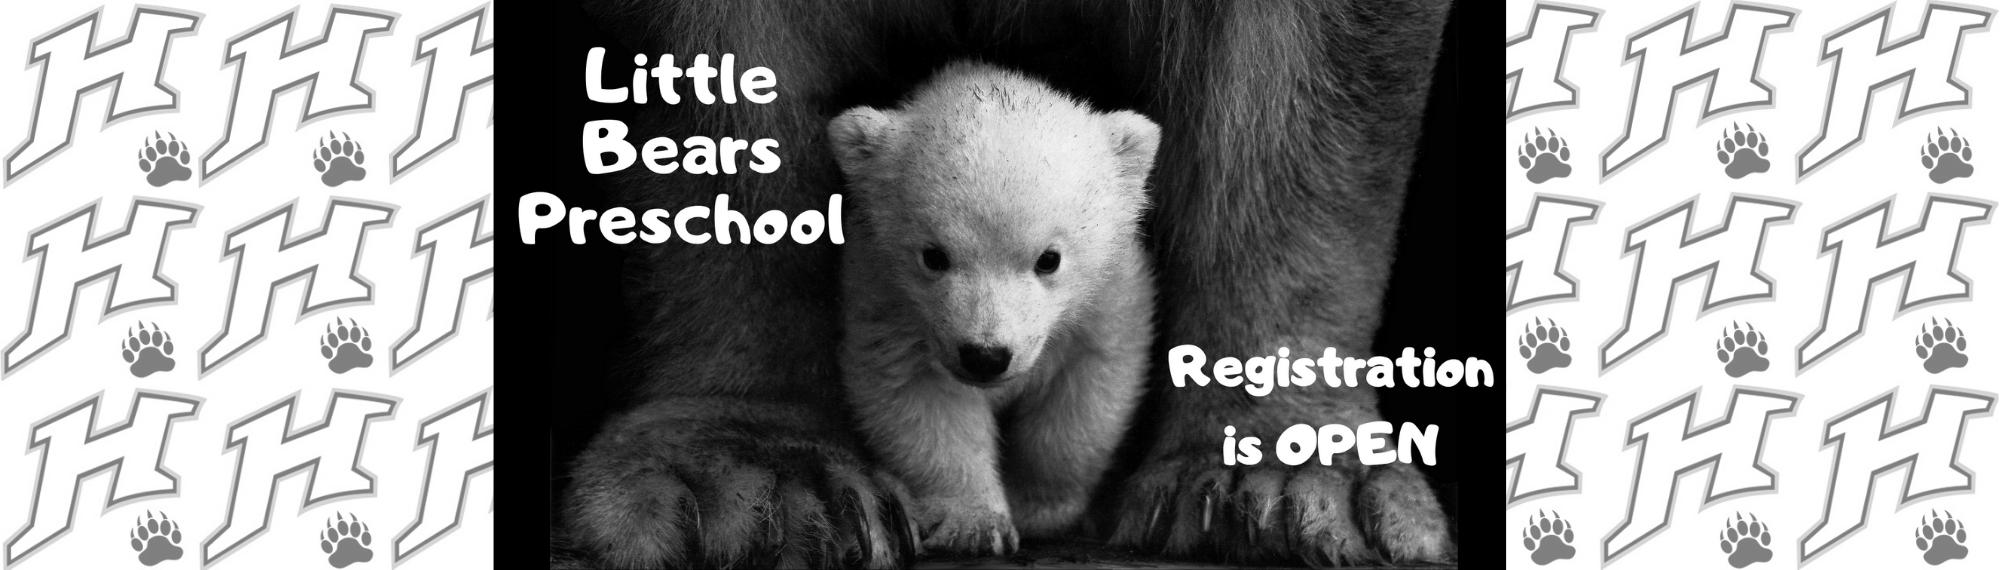 Little Bears Registration Link